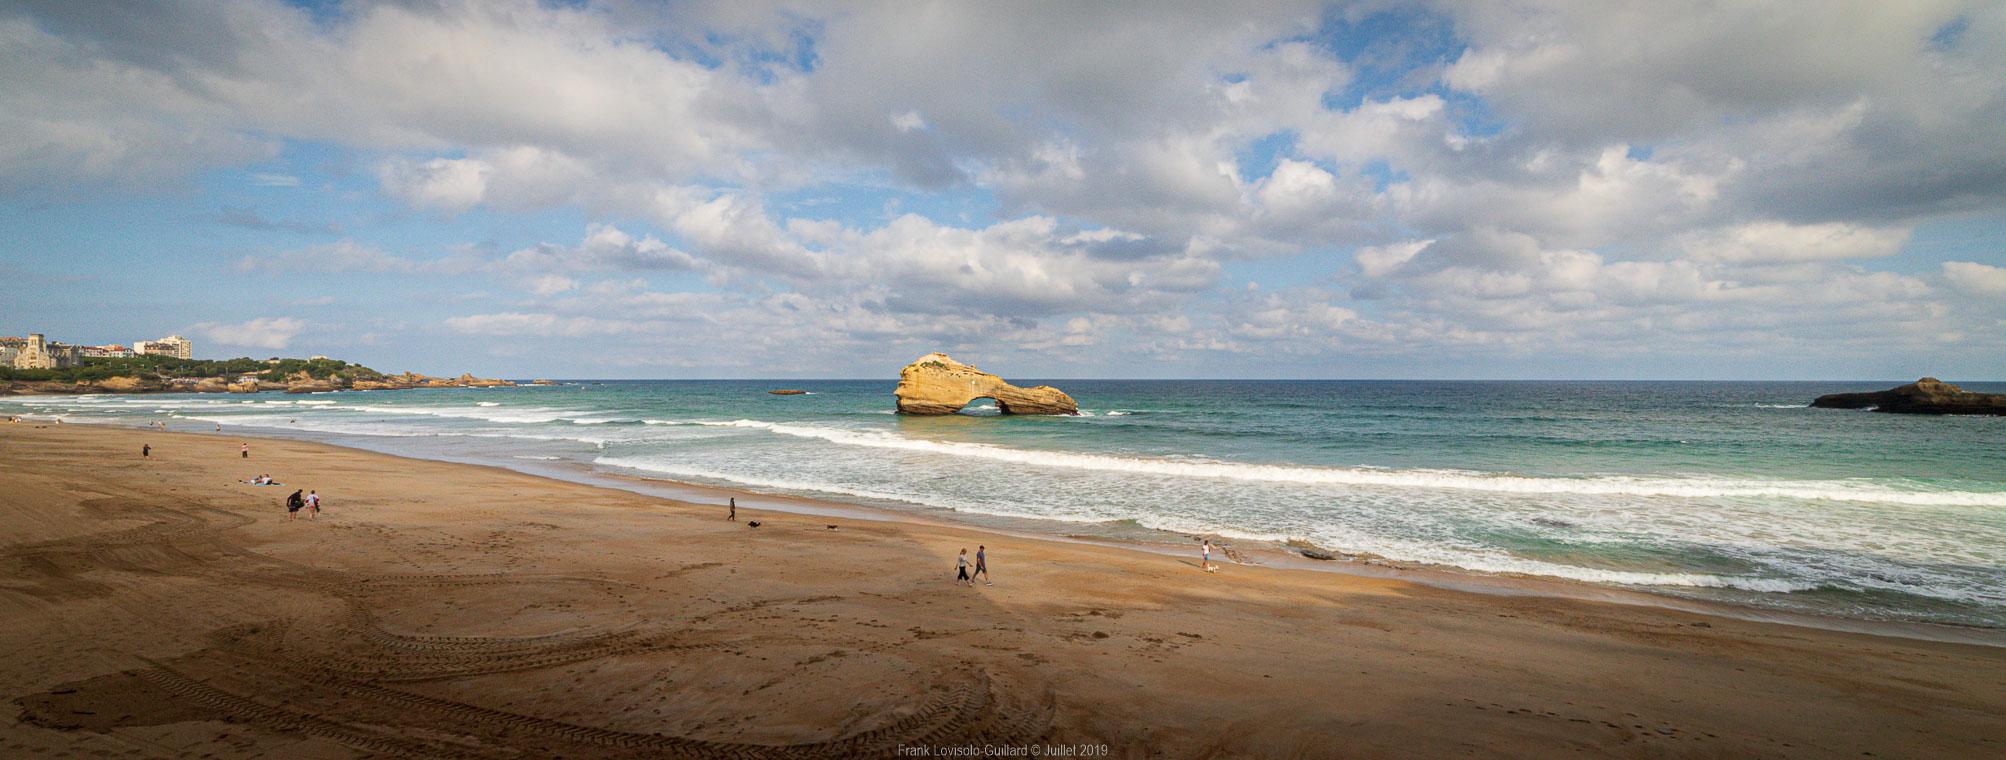 biarritz n 024